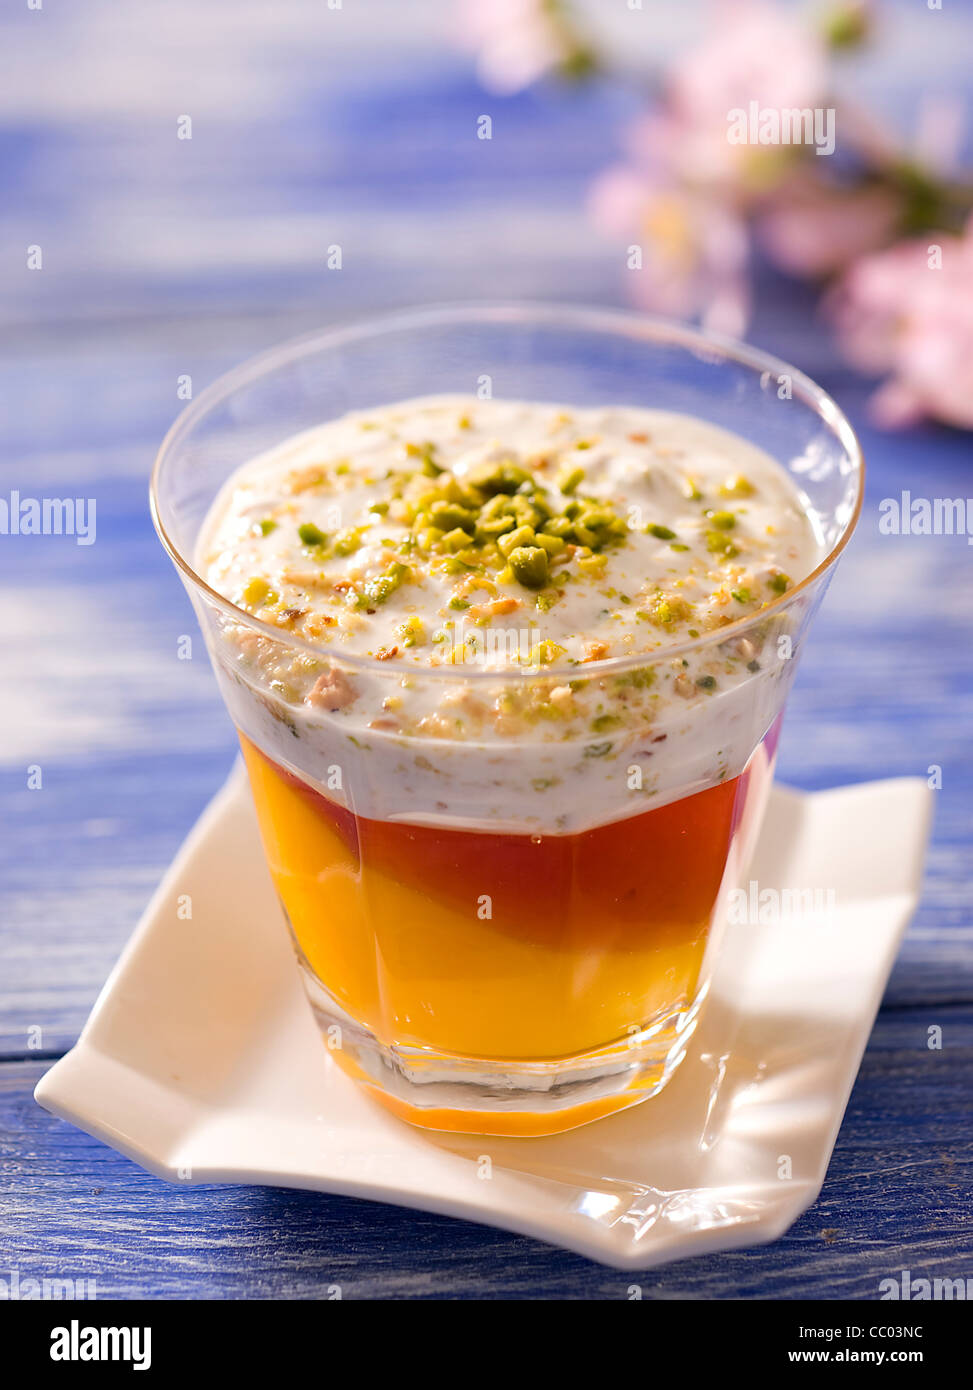 Yogurt and Pistachio Custard - Stock Image